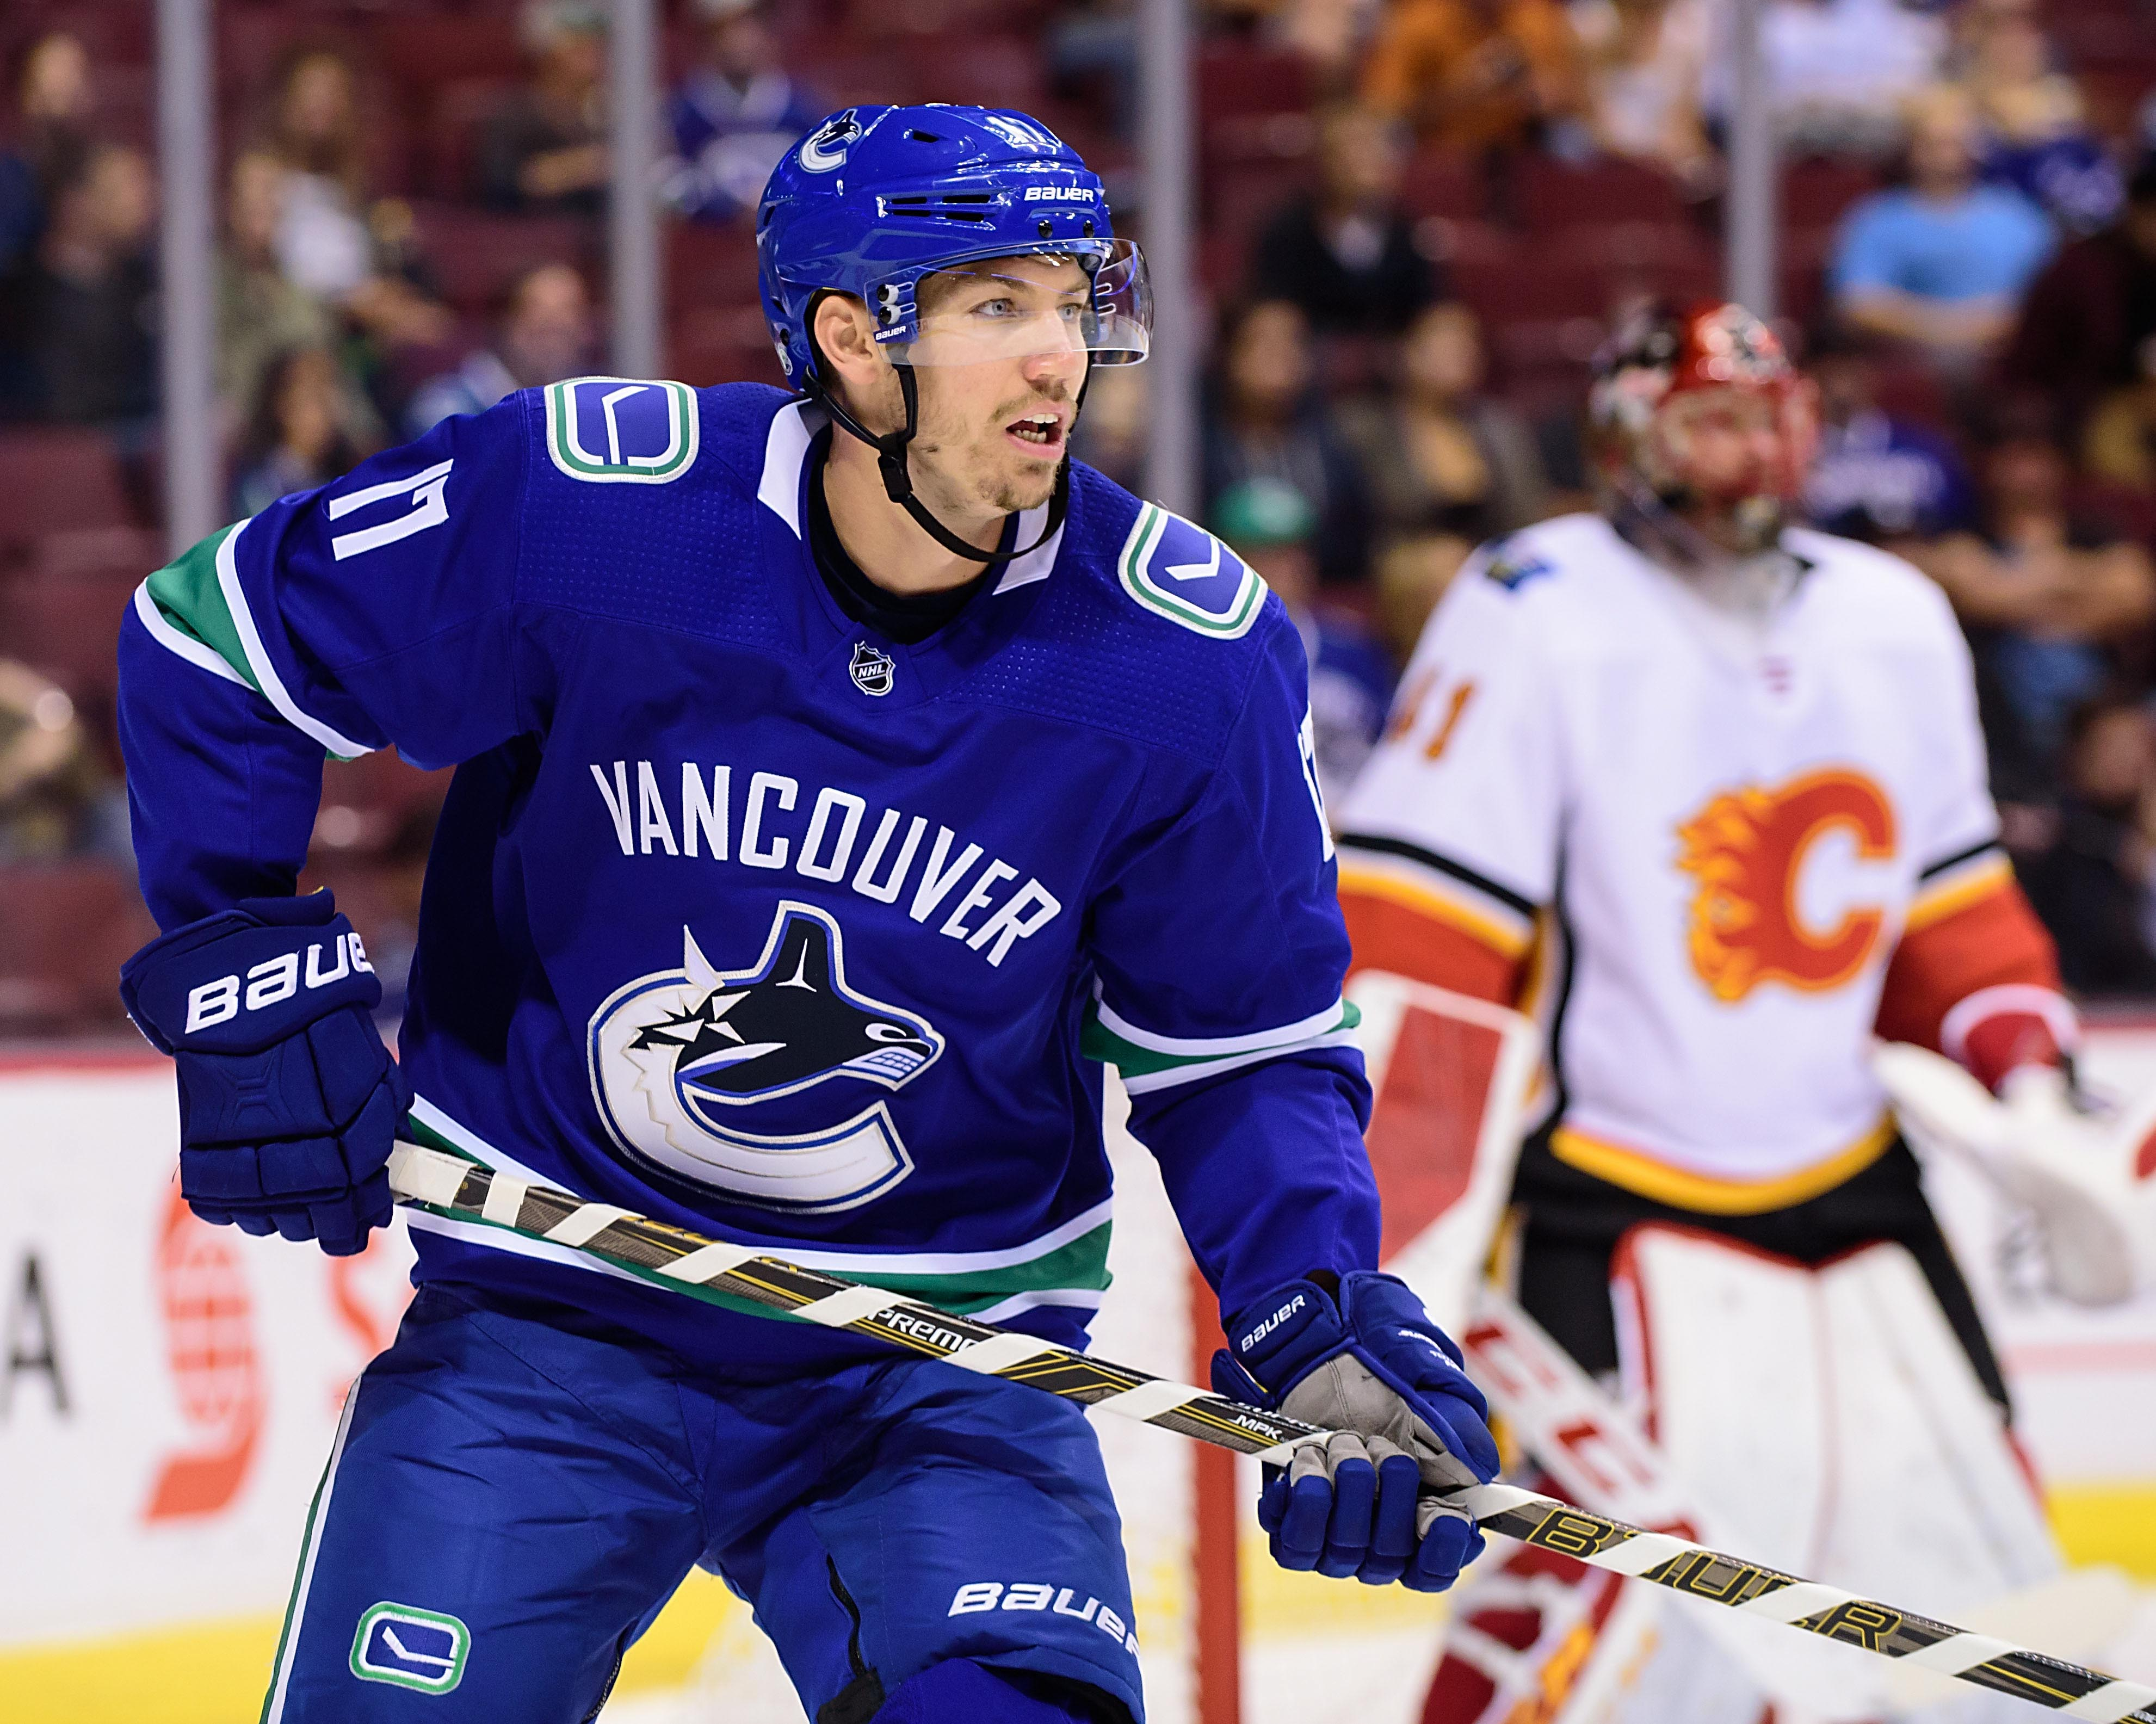 NHL: Preseason-Calgary Flames at Vancouver Canucks